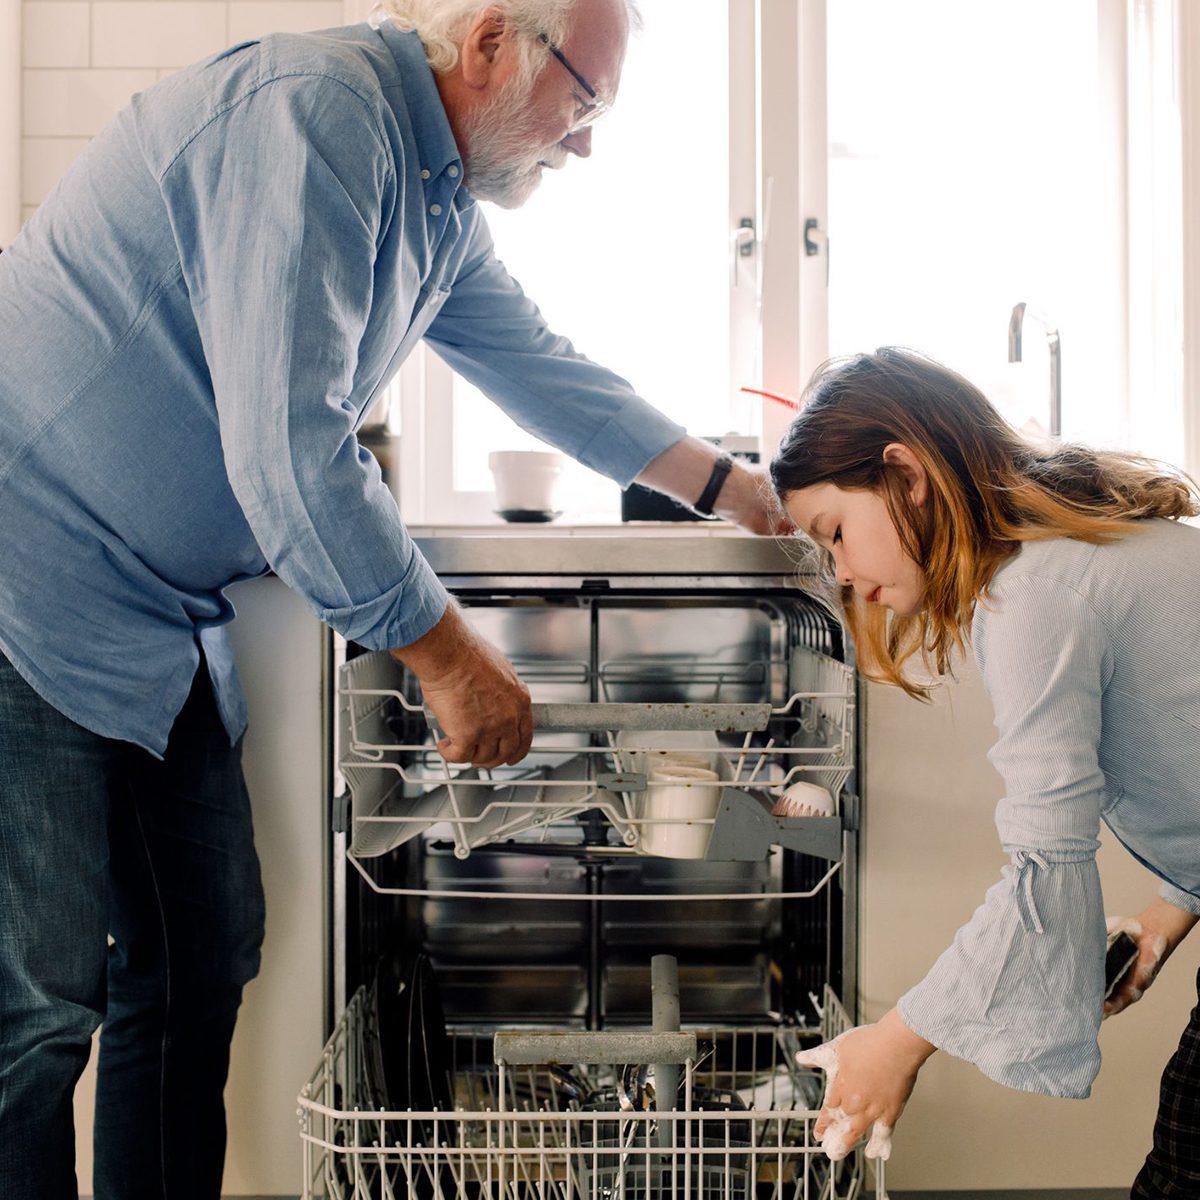 Grandpa and grandkid unloading dishwasher